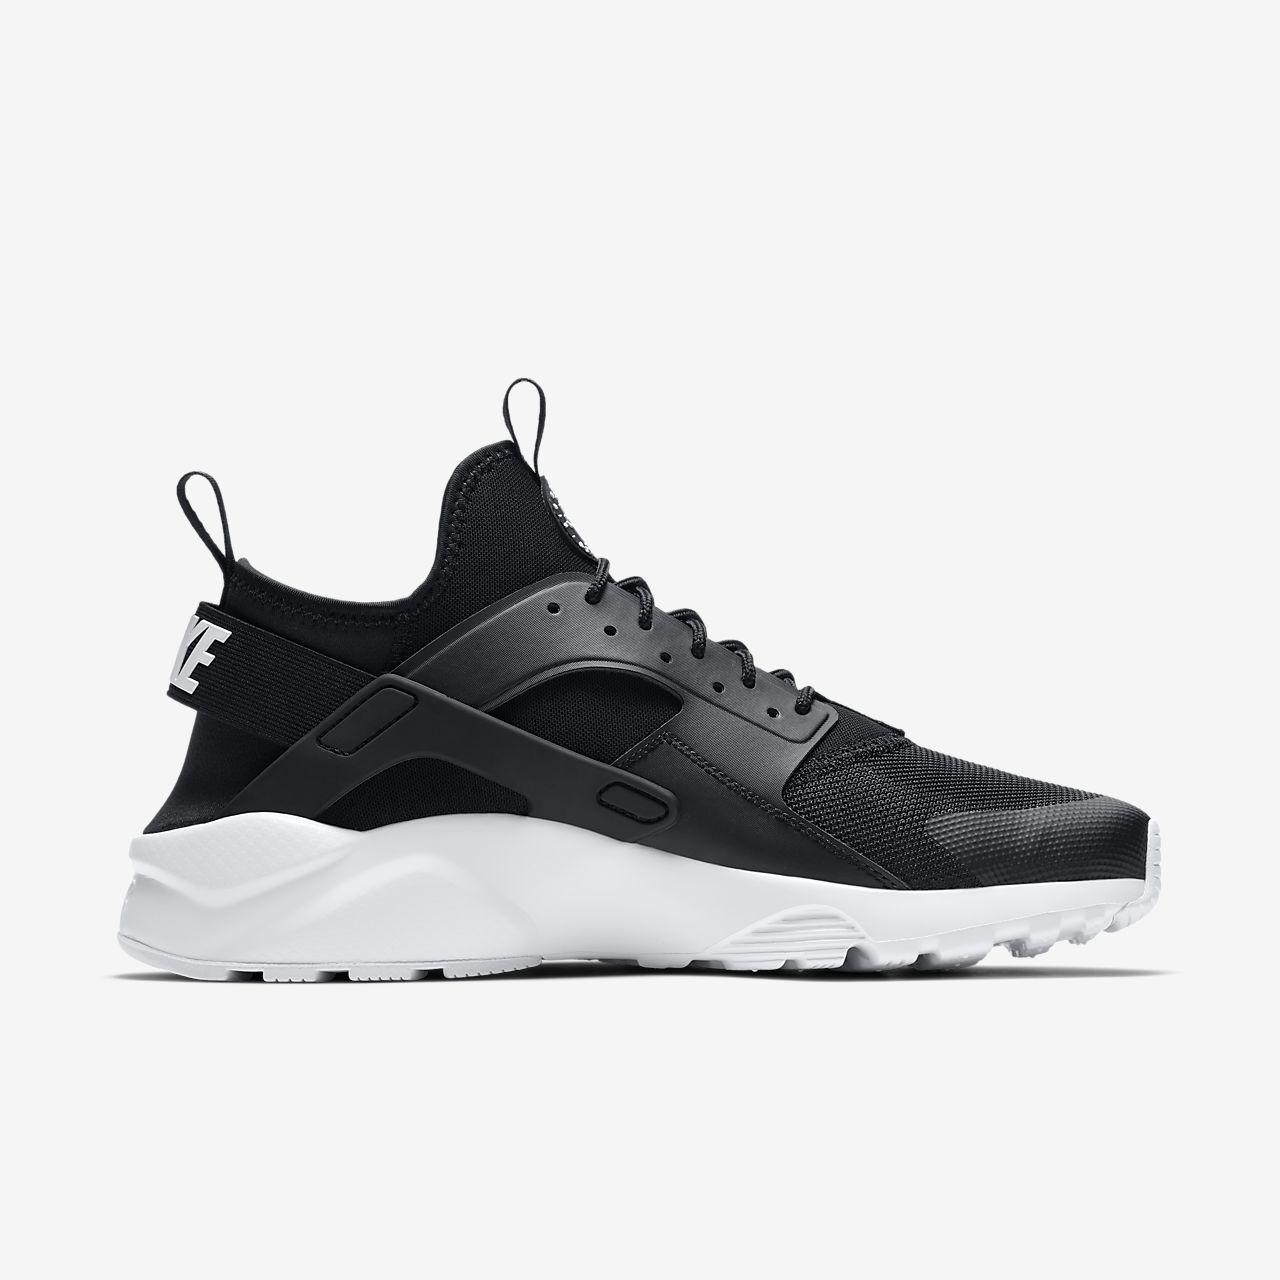 hot sale online 778a6 36ef6 ... Scarpa Nike Air Huarache Ultra - Uomo